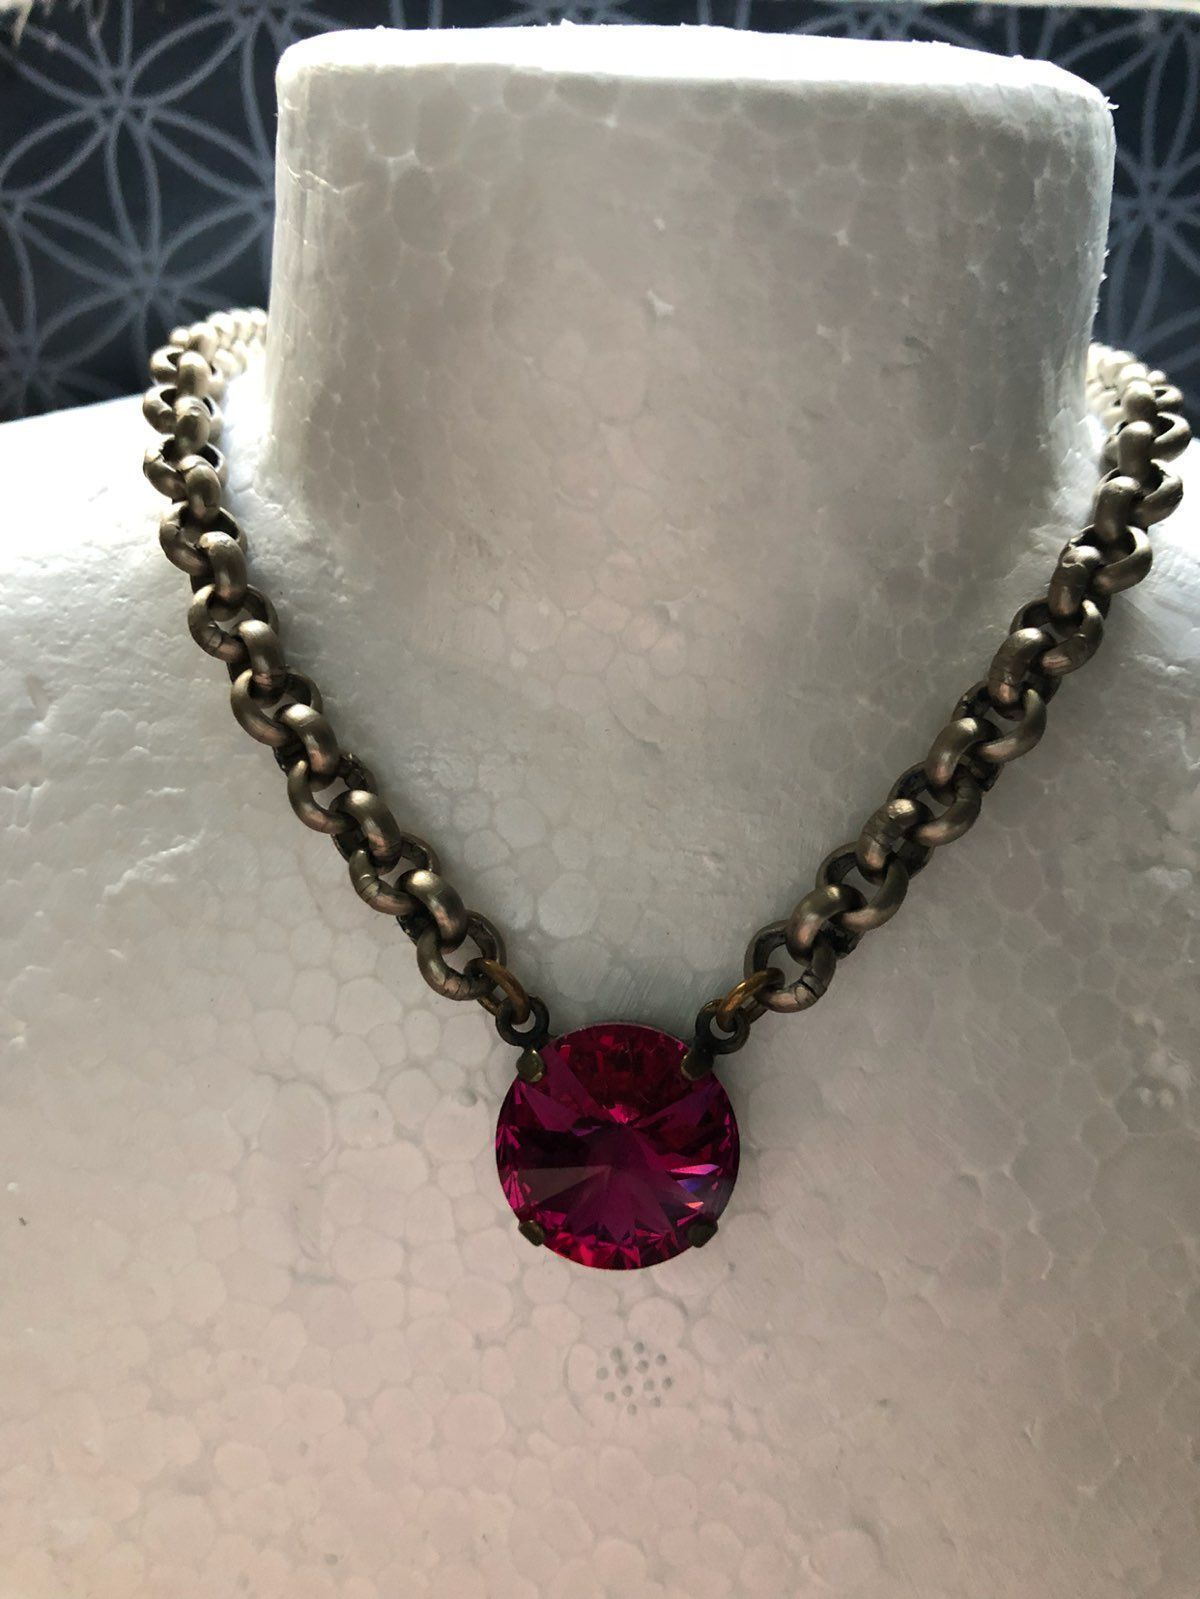 Sabika look necklace - Sabika Fuchsia Single Stone Necklace